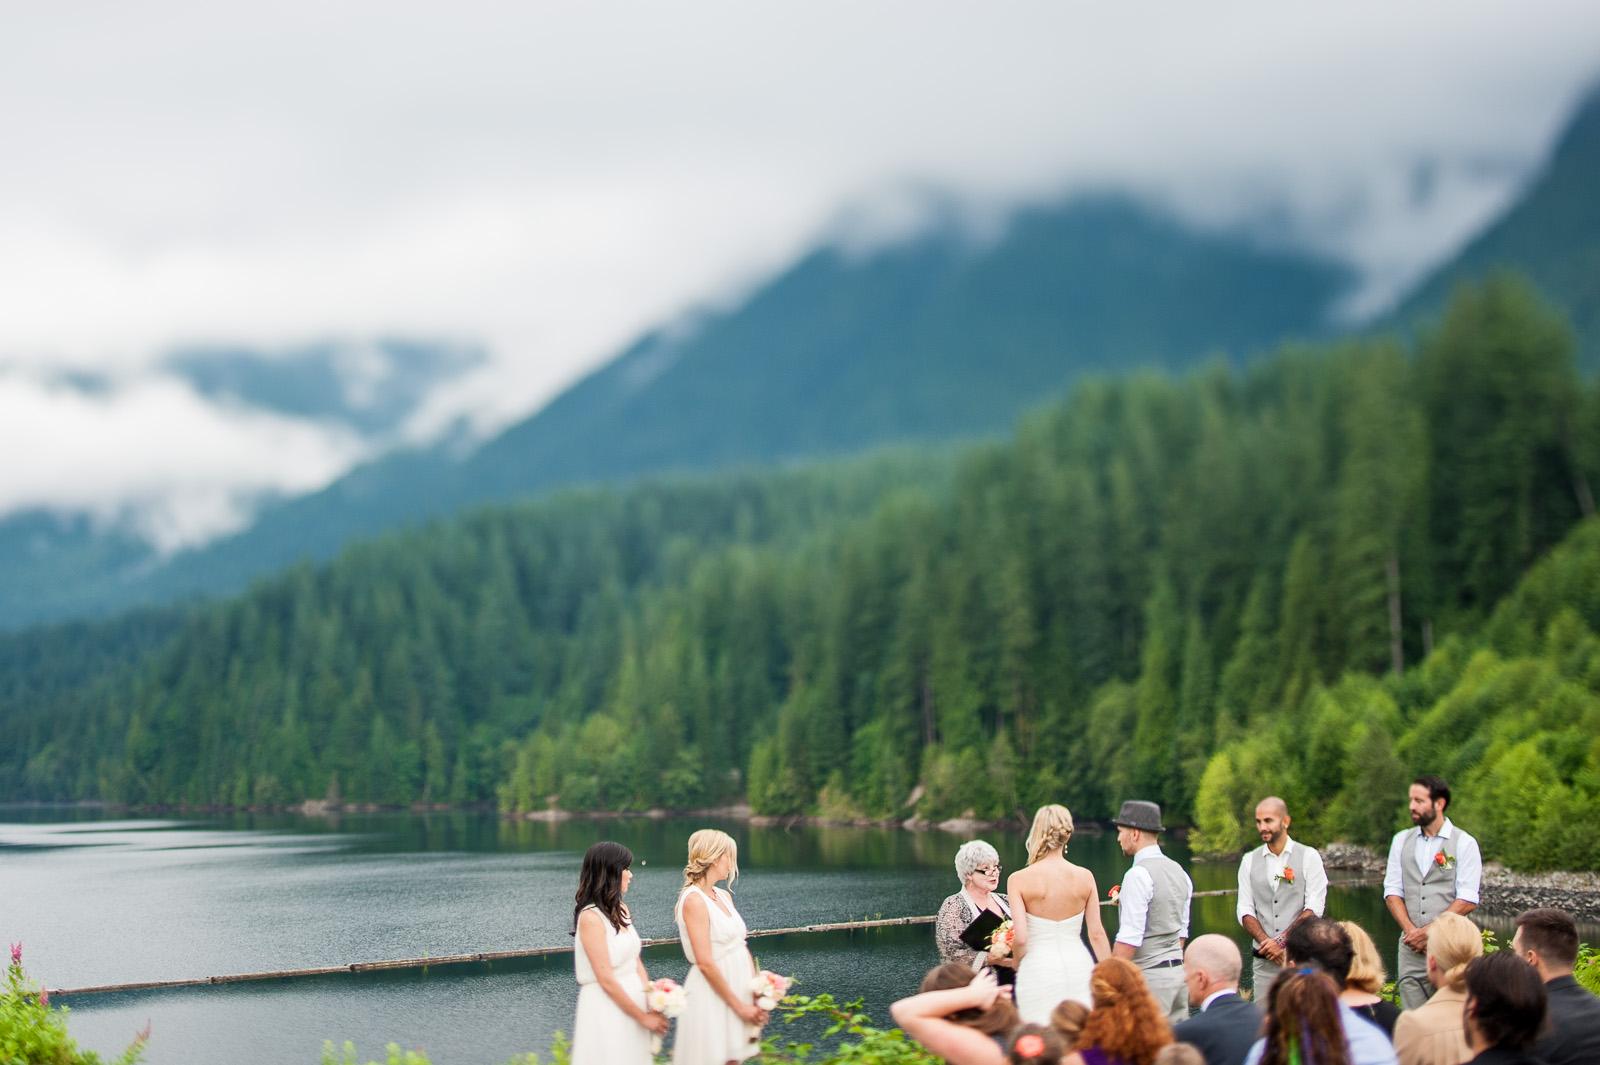 bc-wedding-photographers-cleveland-dam-wedding-08.jpg